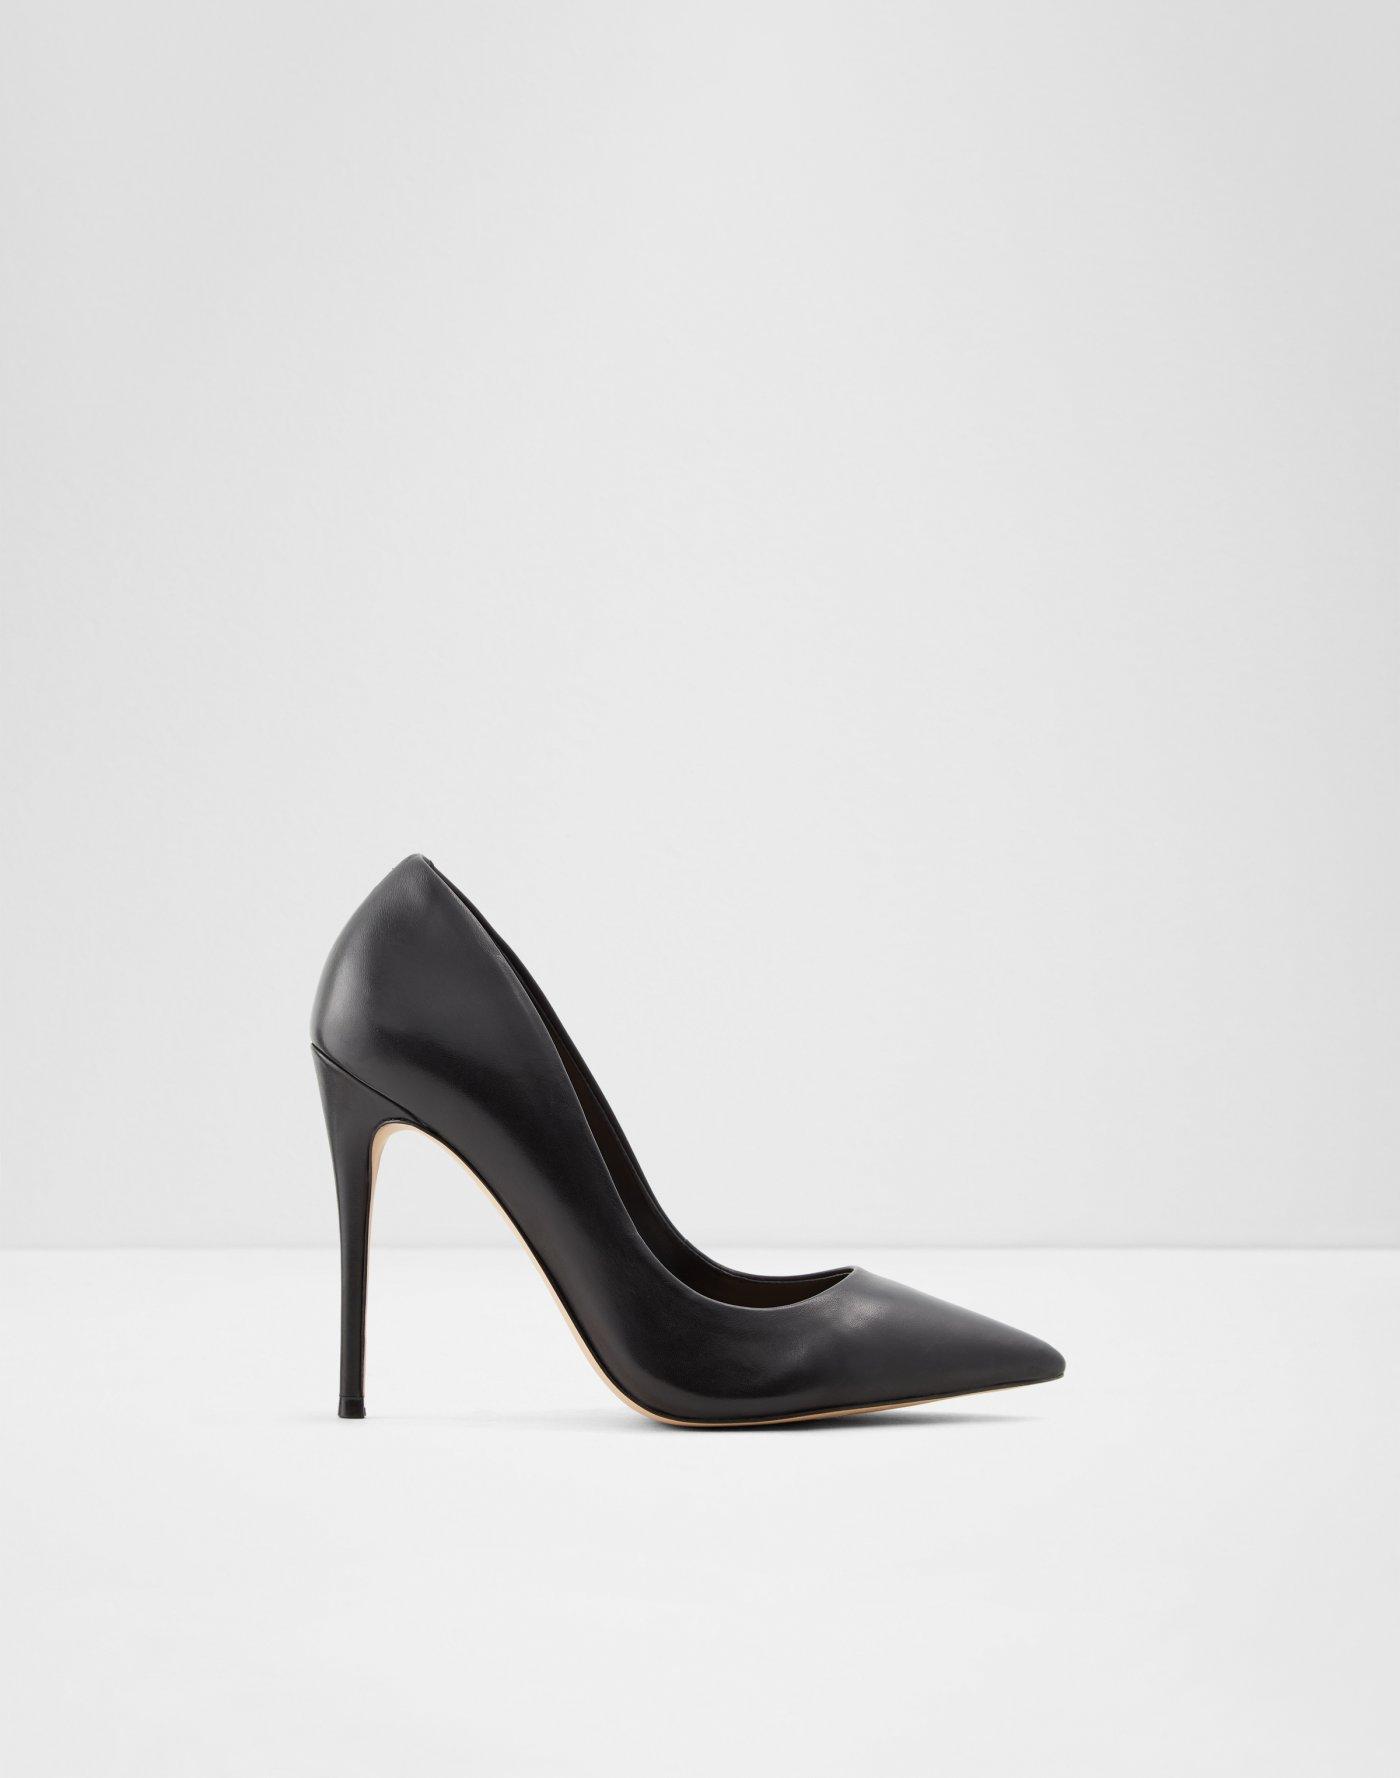 bdf2626b7c1 Heels